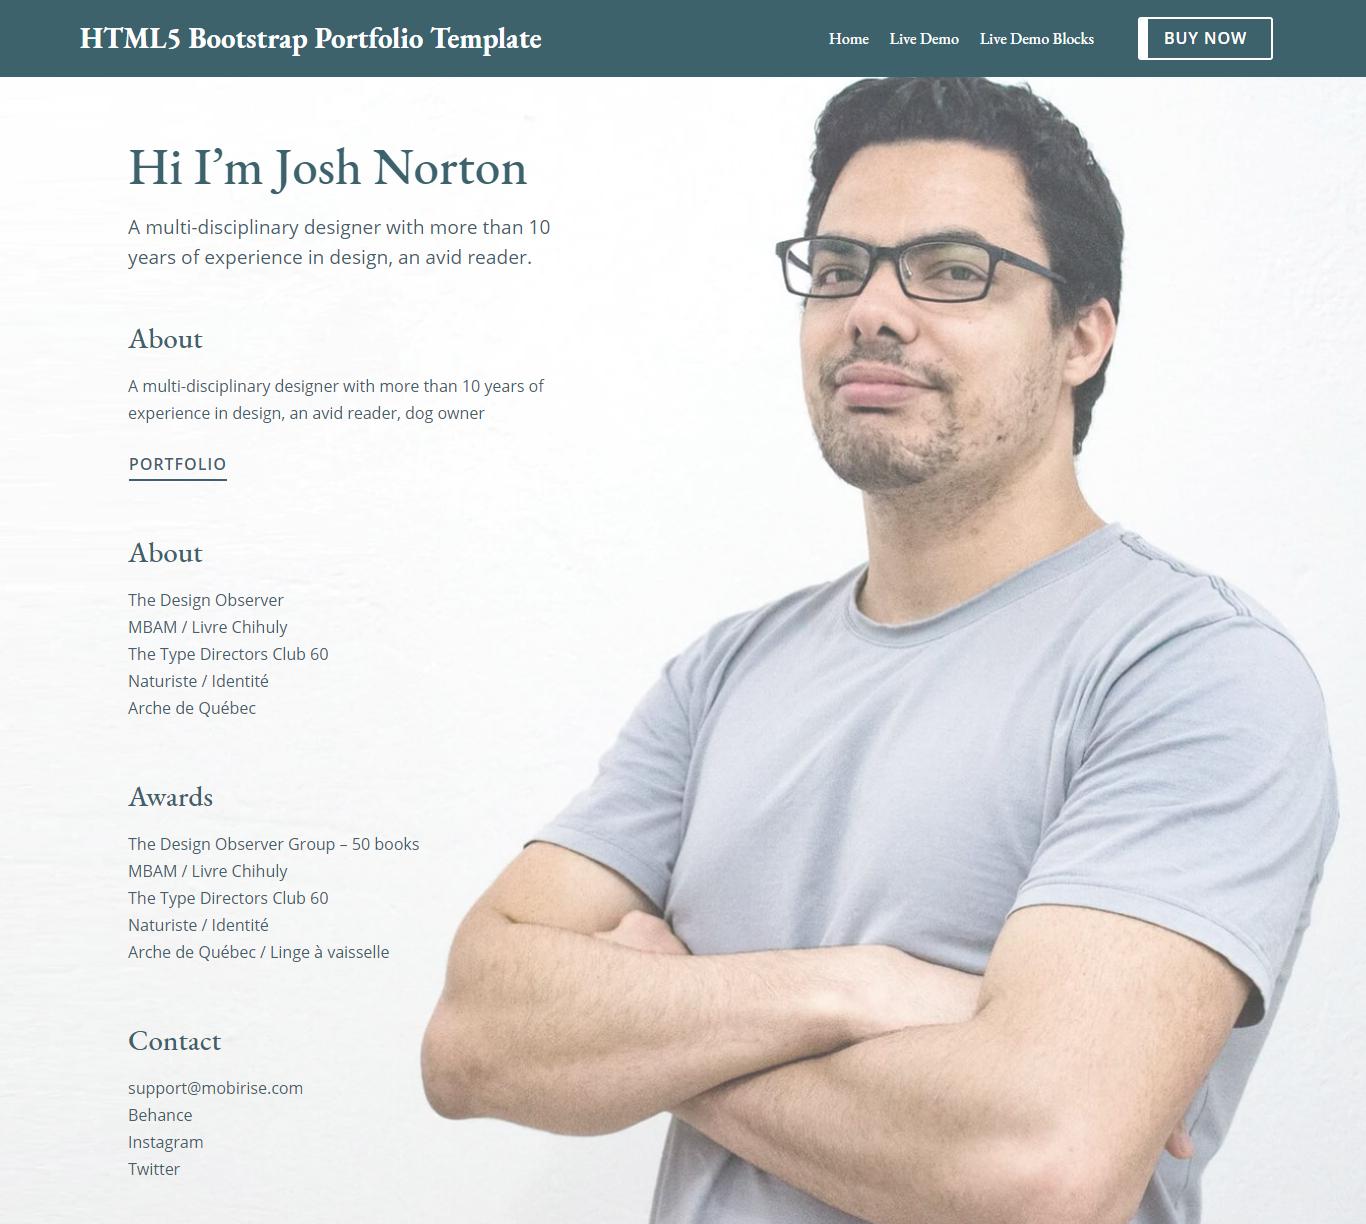 HTML5 Bootstrap Portfolio Template